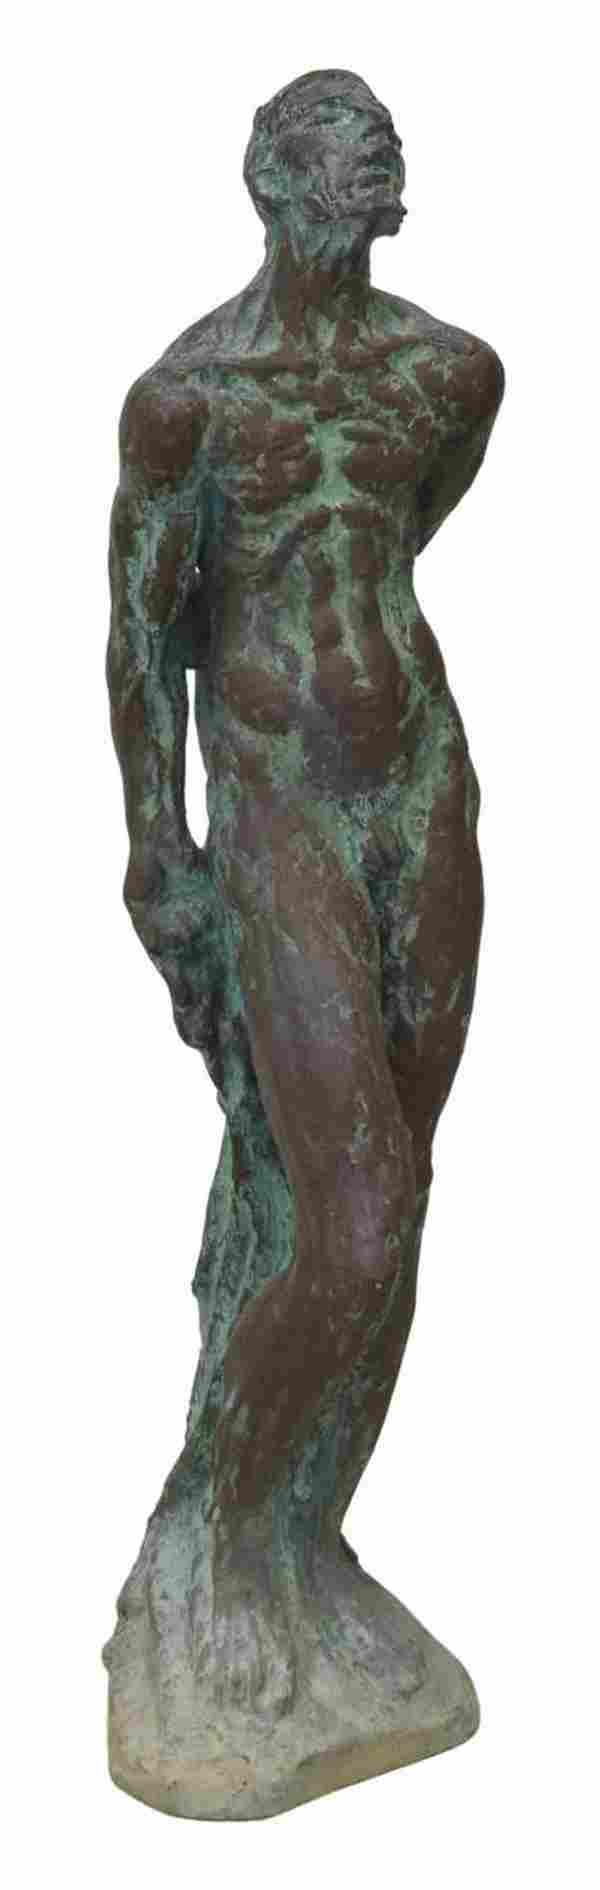 "CHARLES UMLAUF (1911-1994) ST SEBASTIAN BRONZE 41"""